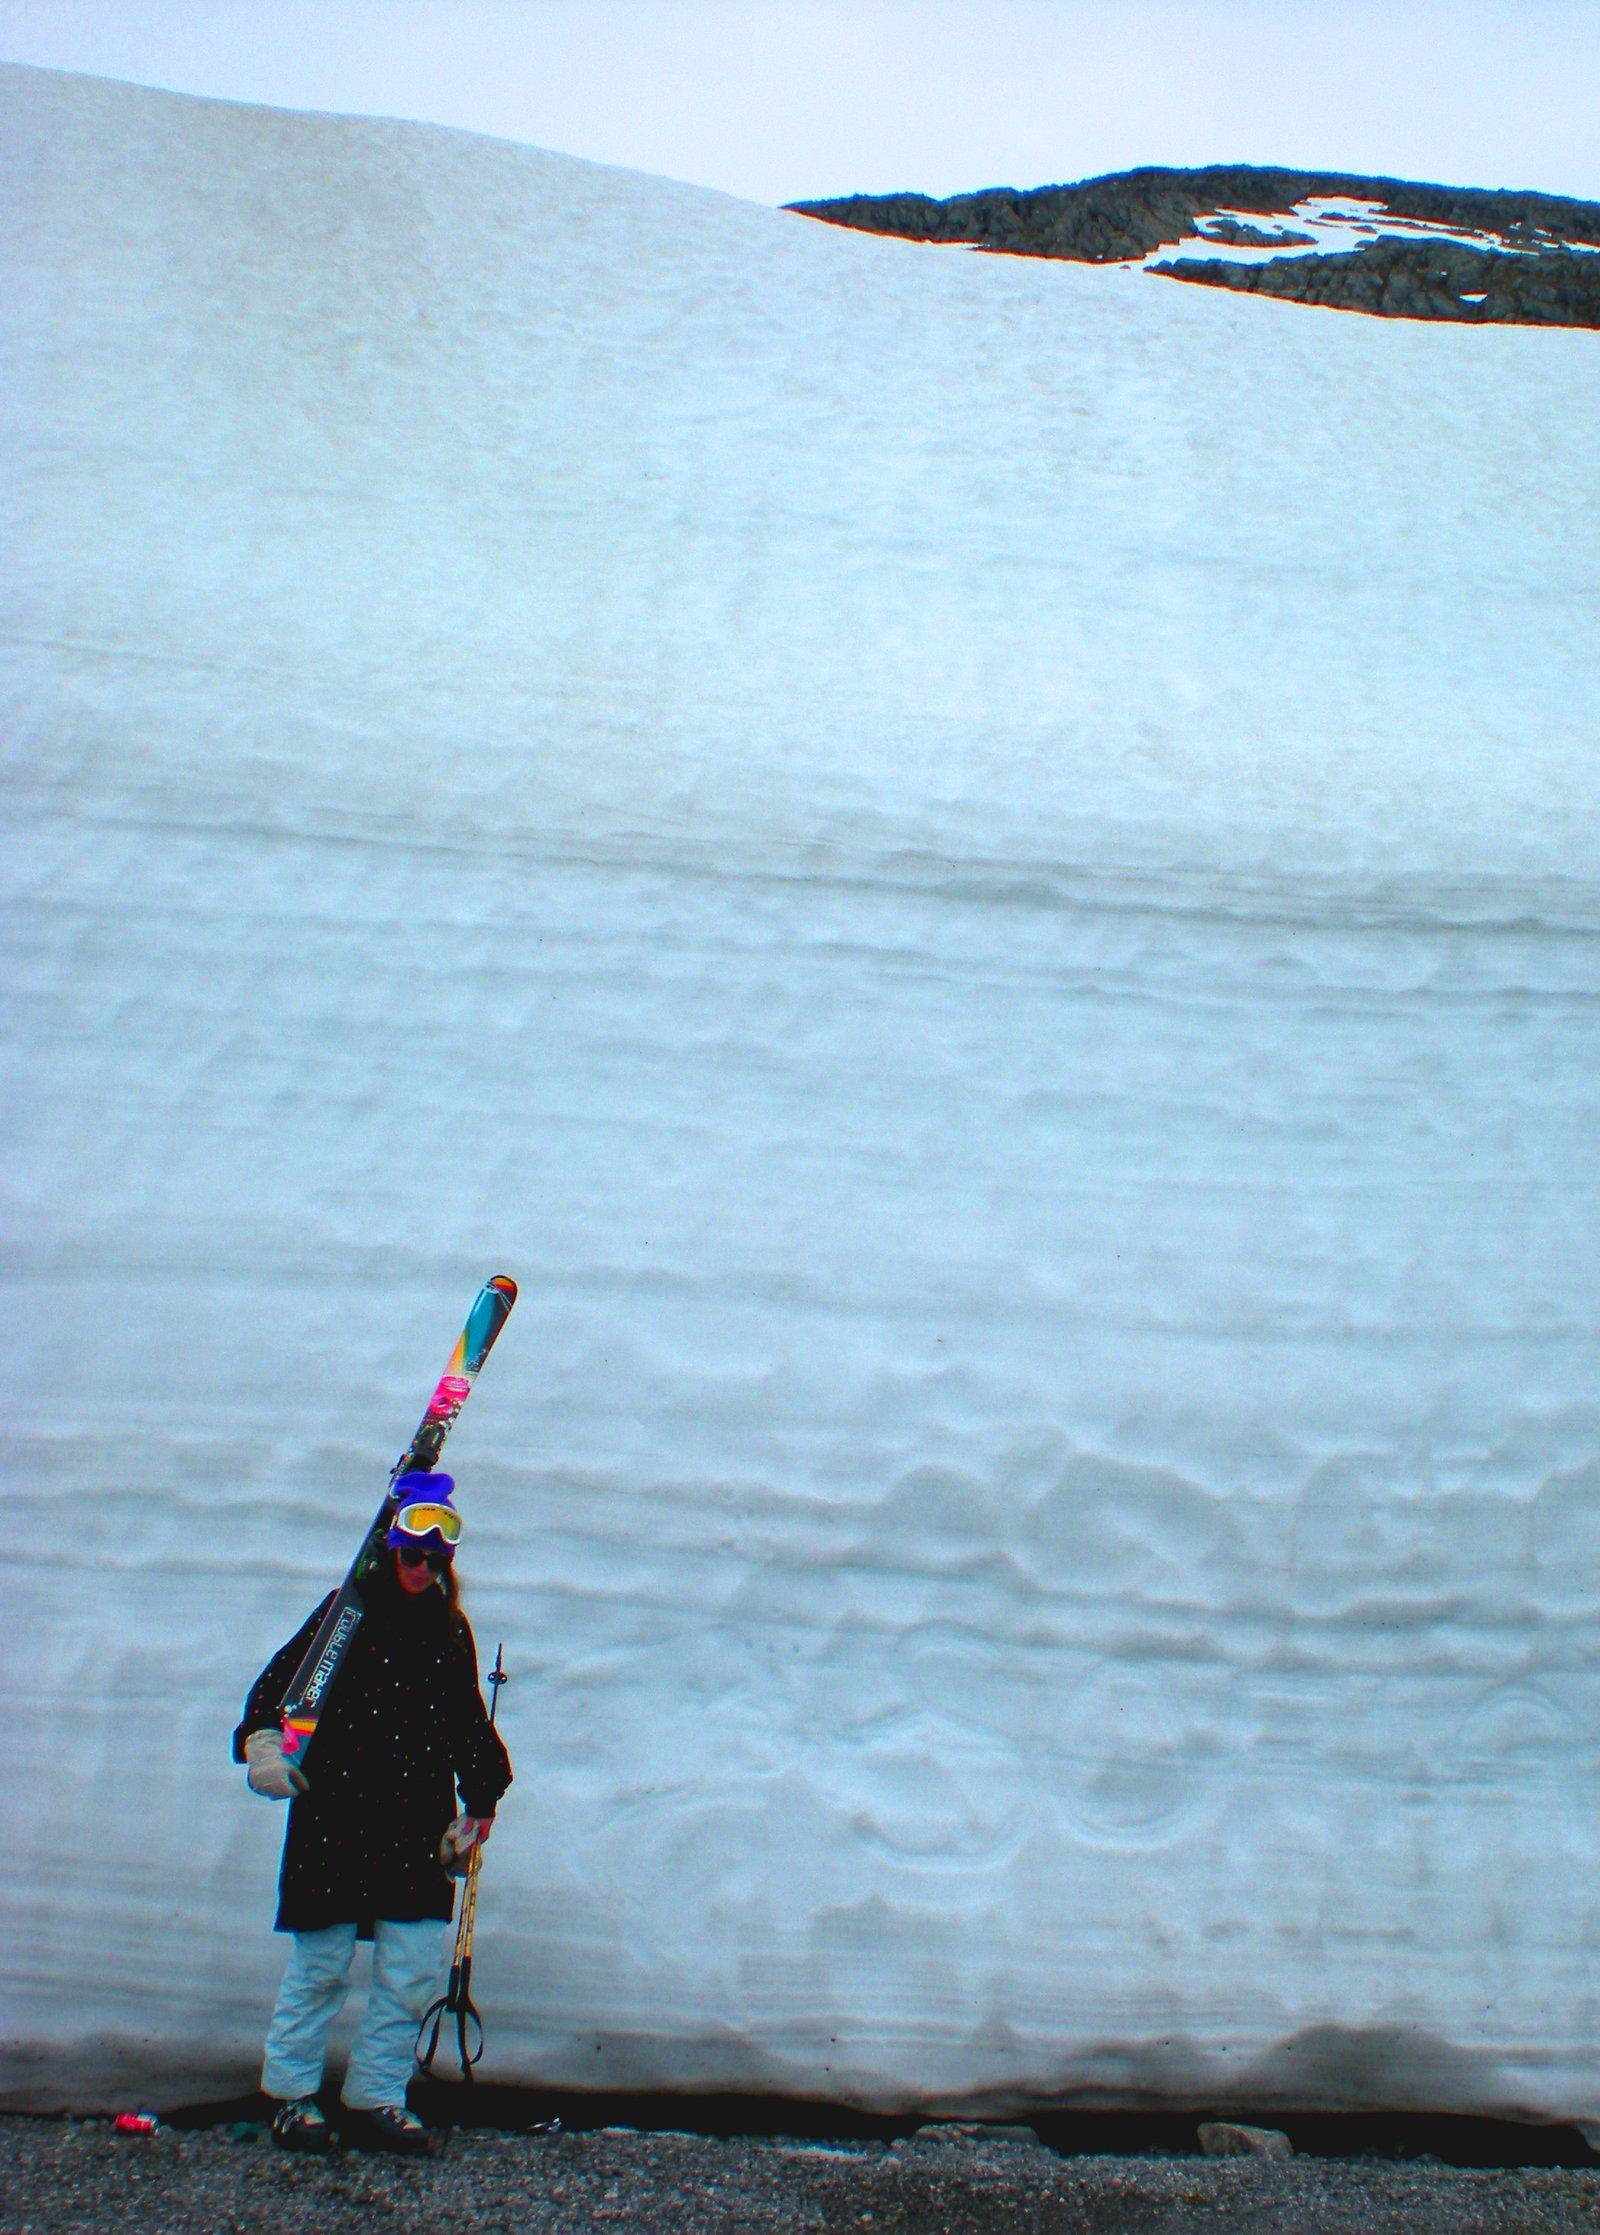 Sum shiet. sum snow.